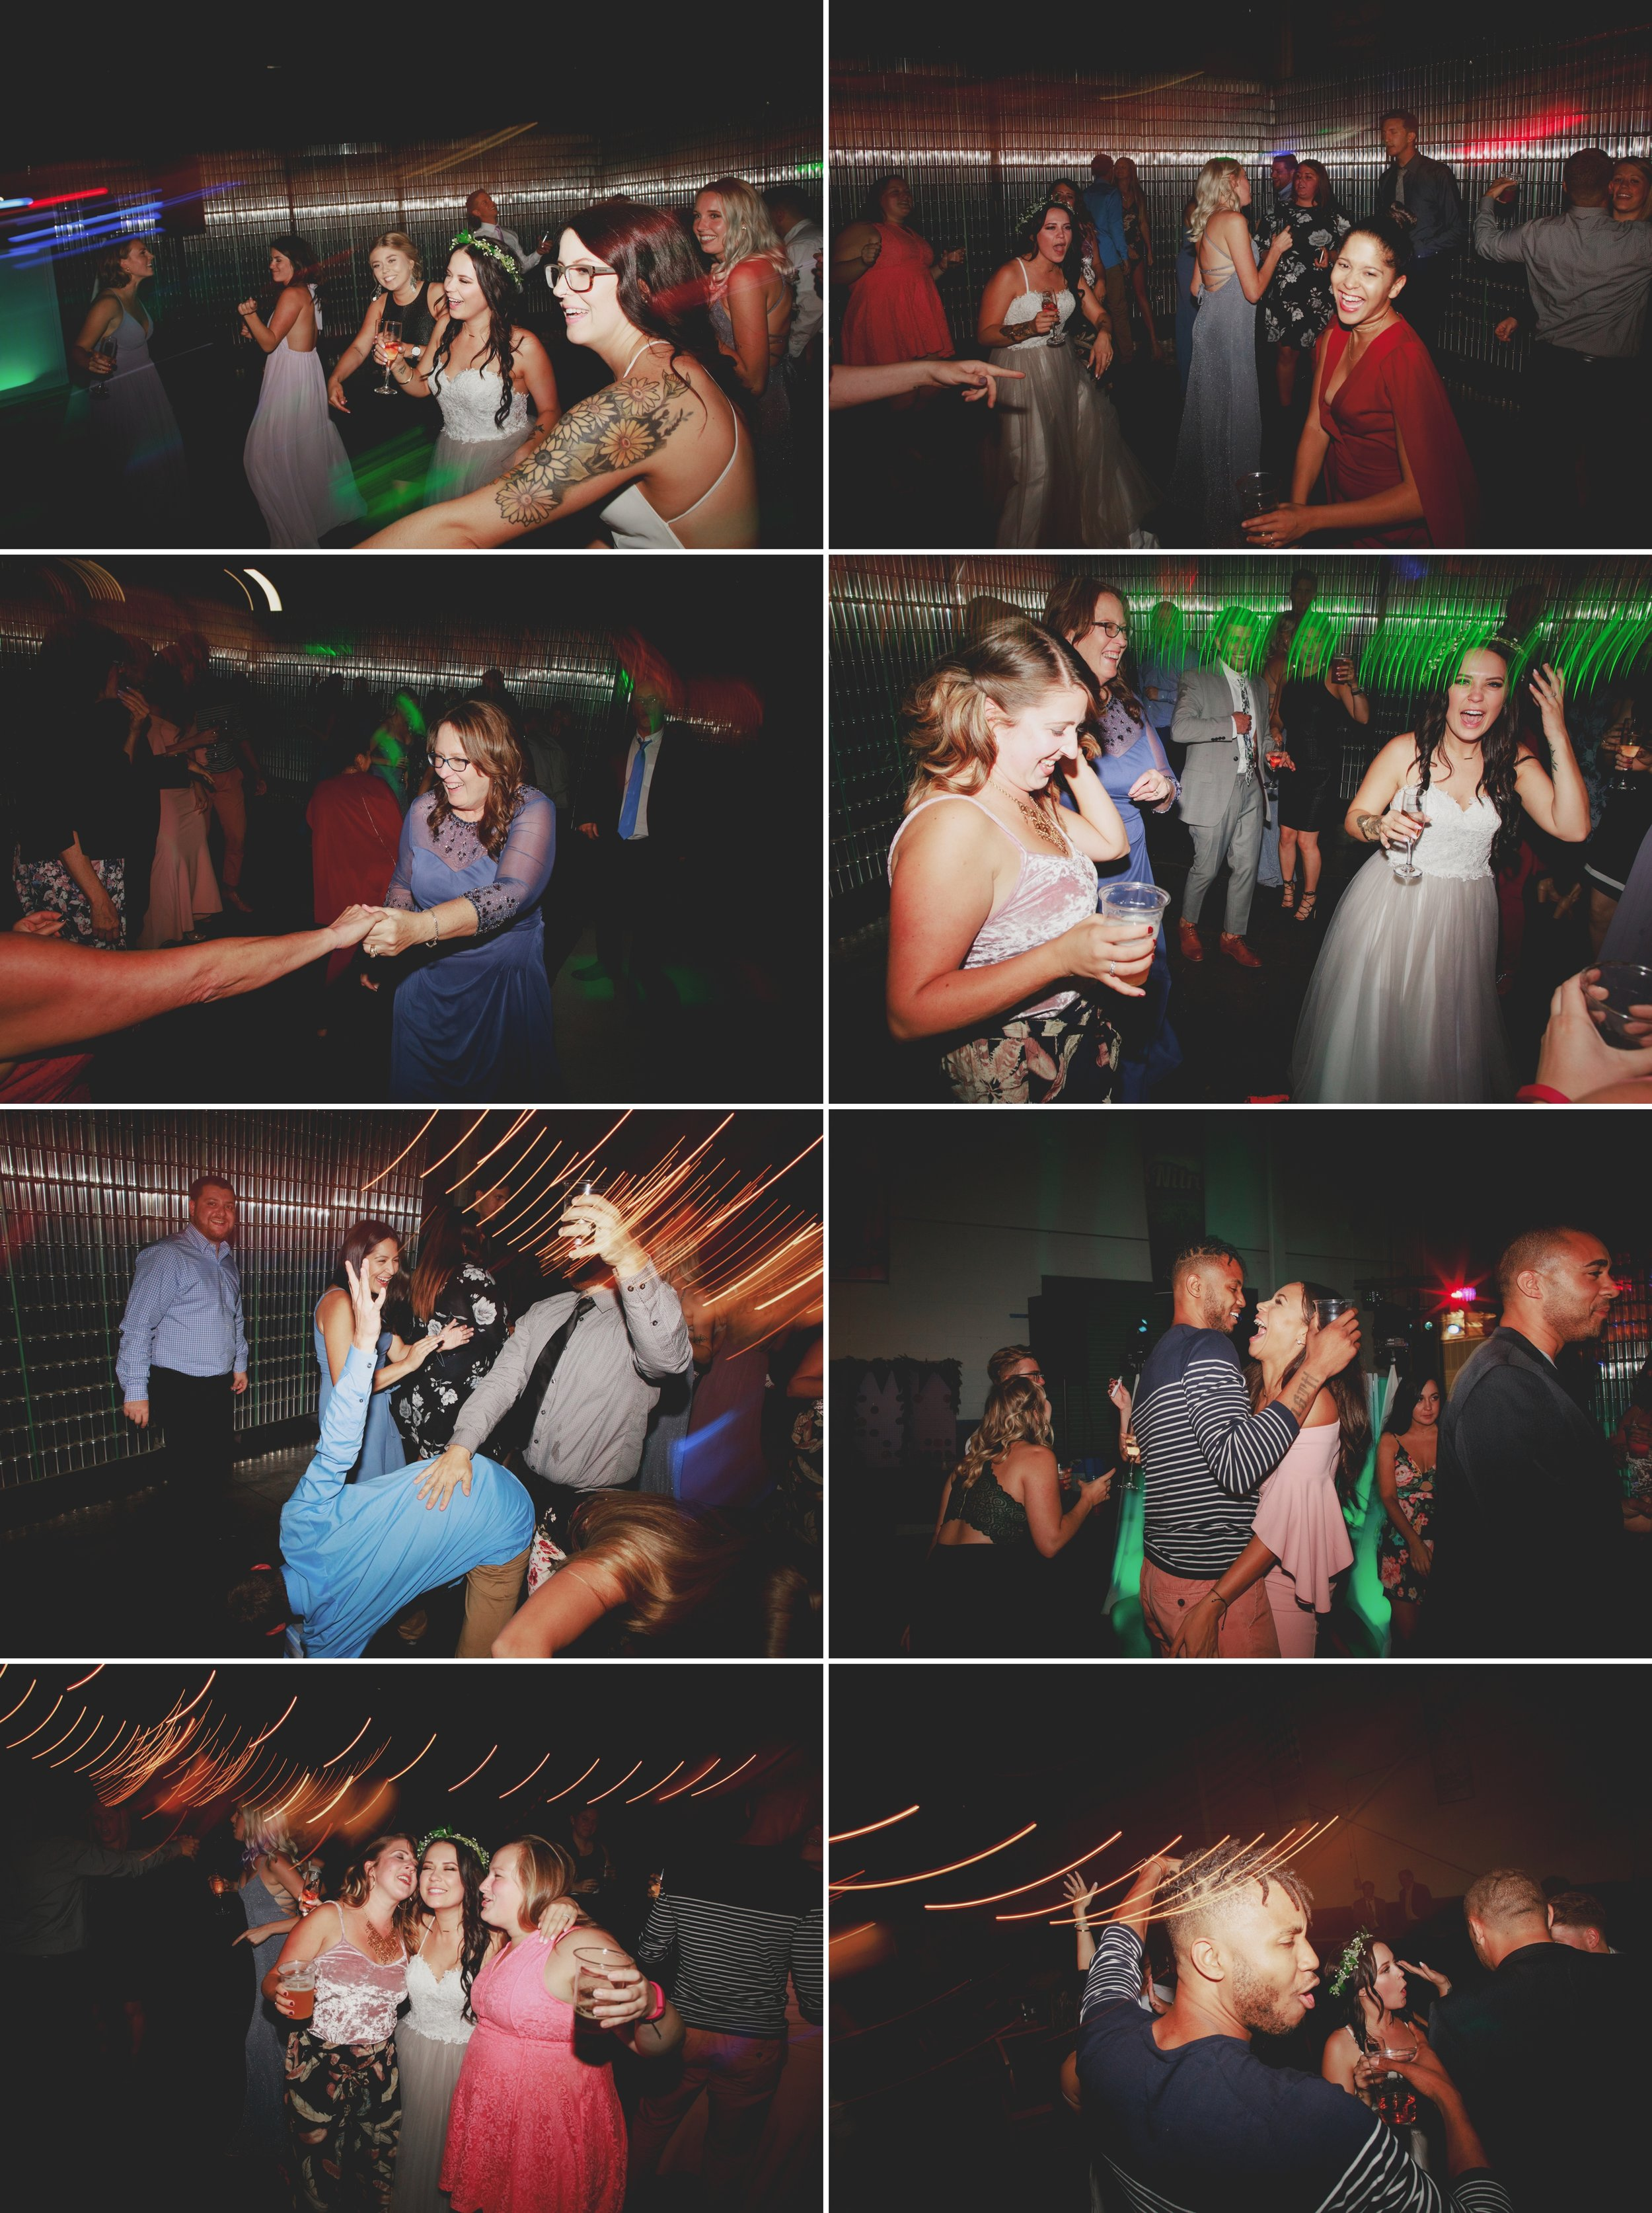 amanda_vanvels_michigan_camp_wedding_184.jpg